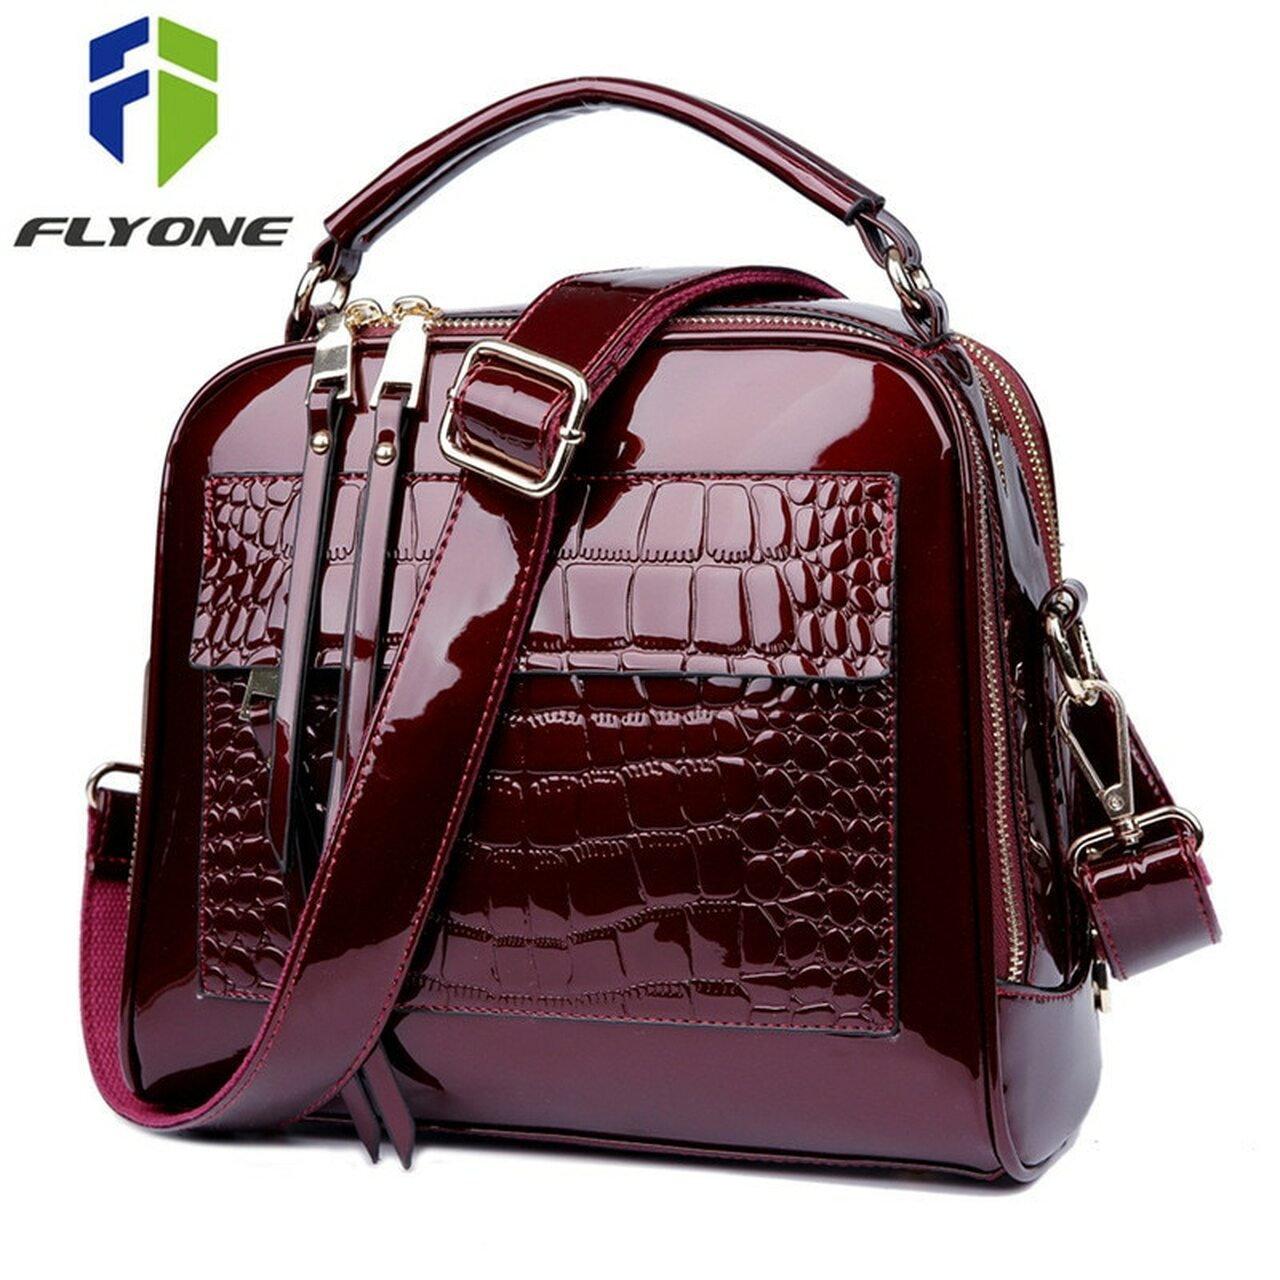 Luxury Handbags Women Bags Designer Crossbody Bags for Women Shoulder Bag  Crocodile Leather Purse Bolsa Feminina Sac Main Femme - OnshopDeals.Com 7dbb0a2b47701